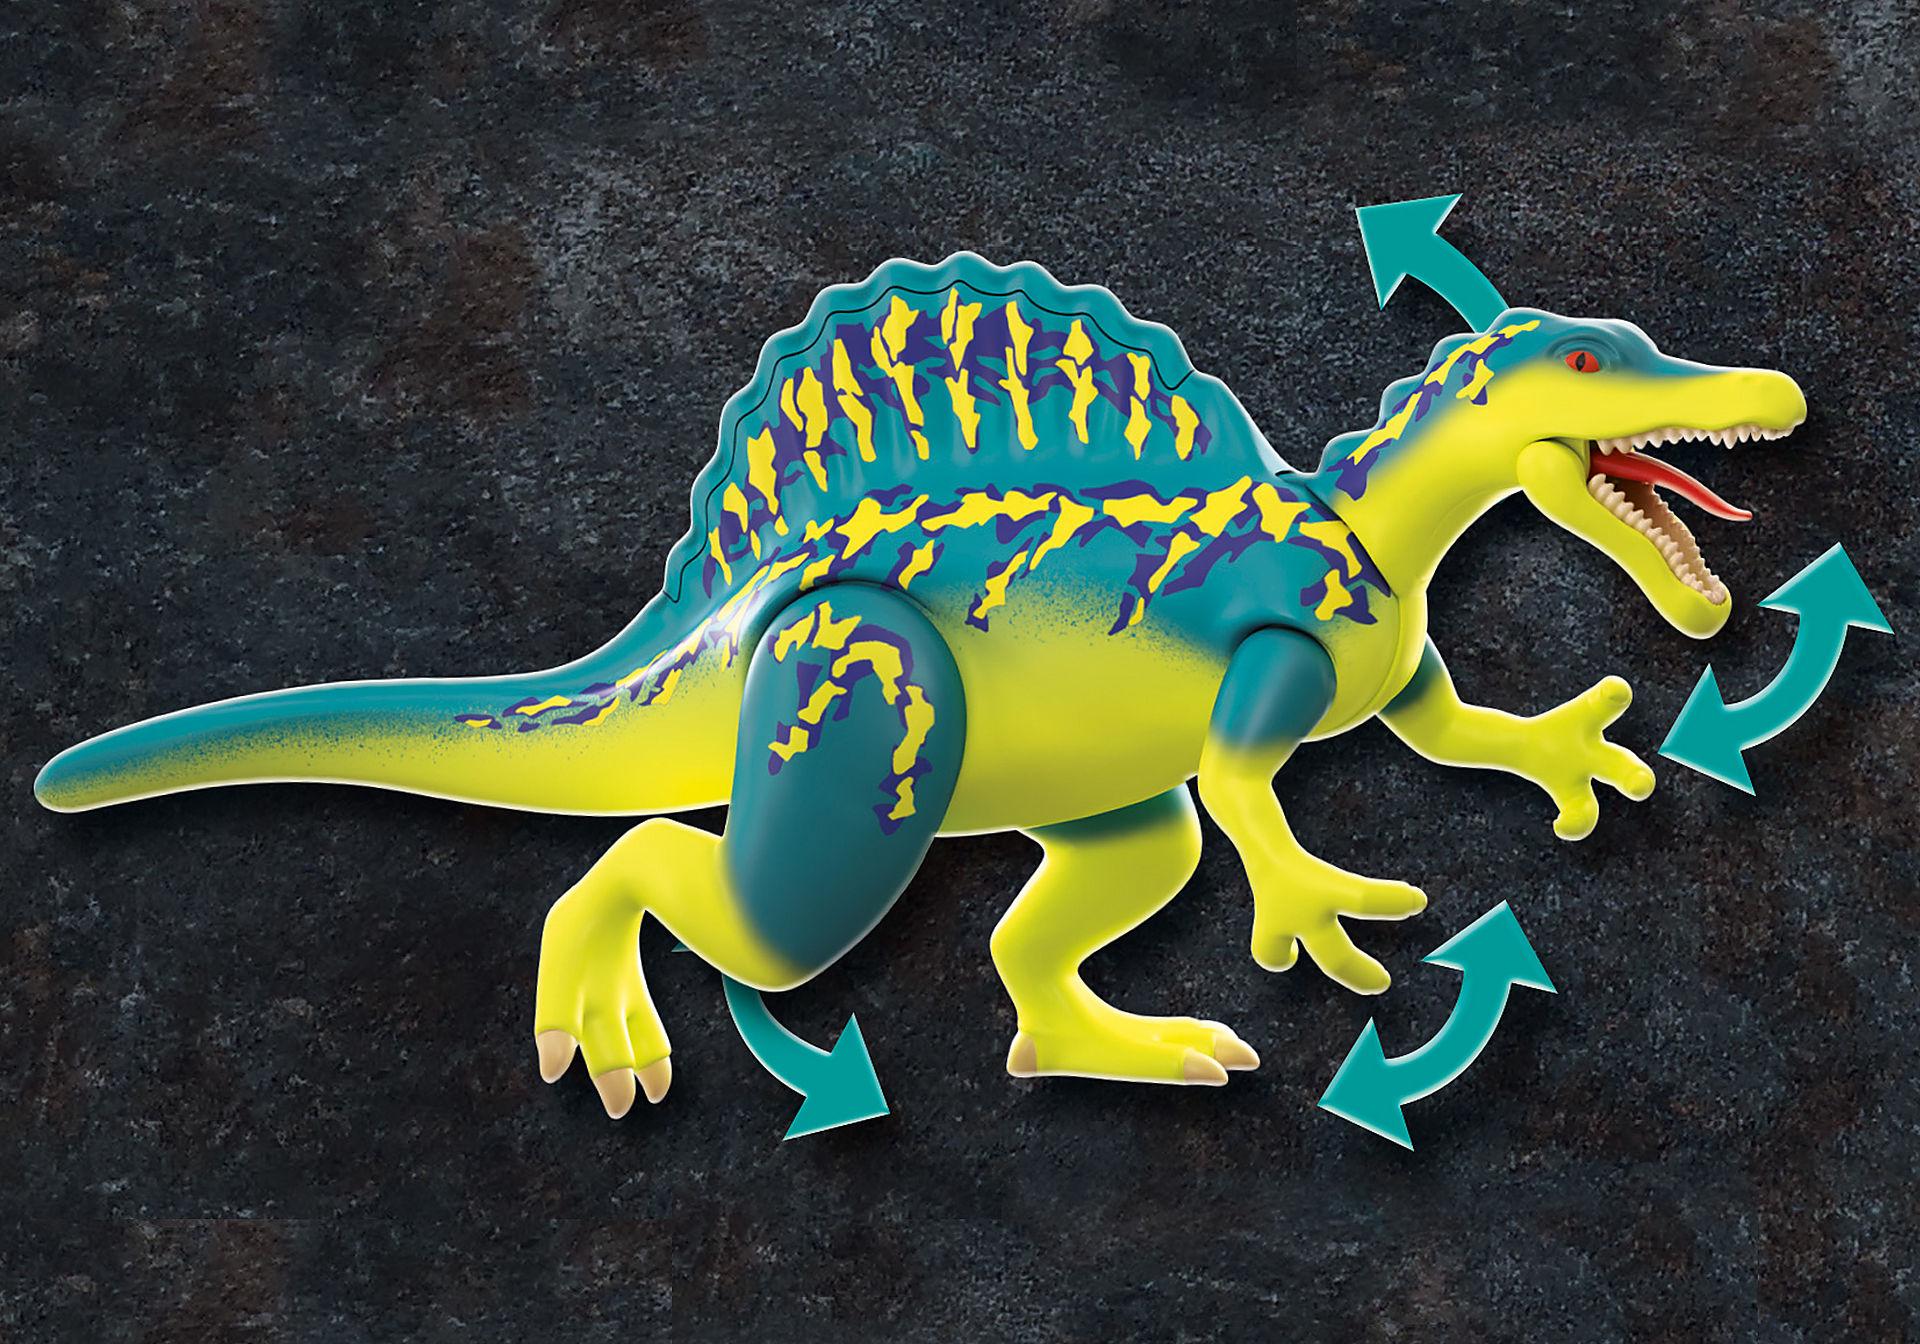 70625 Spinosaurus: Double Defense Power zoom image3